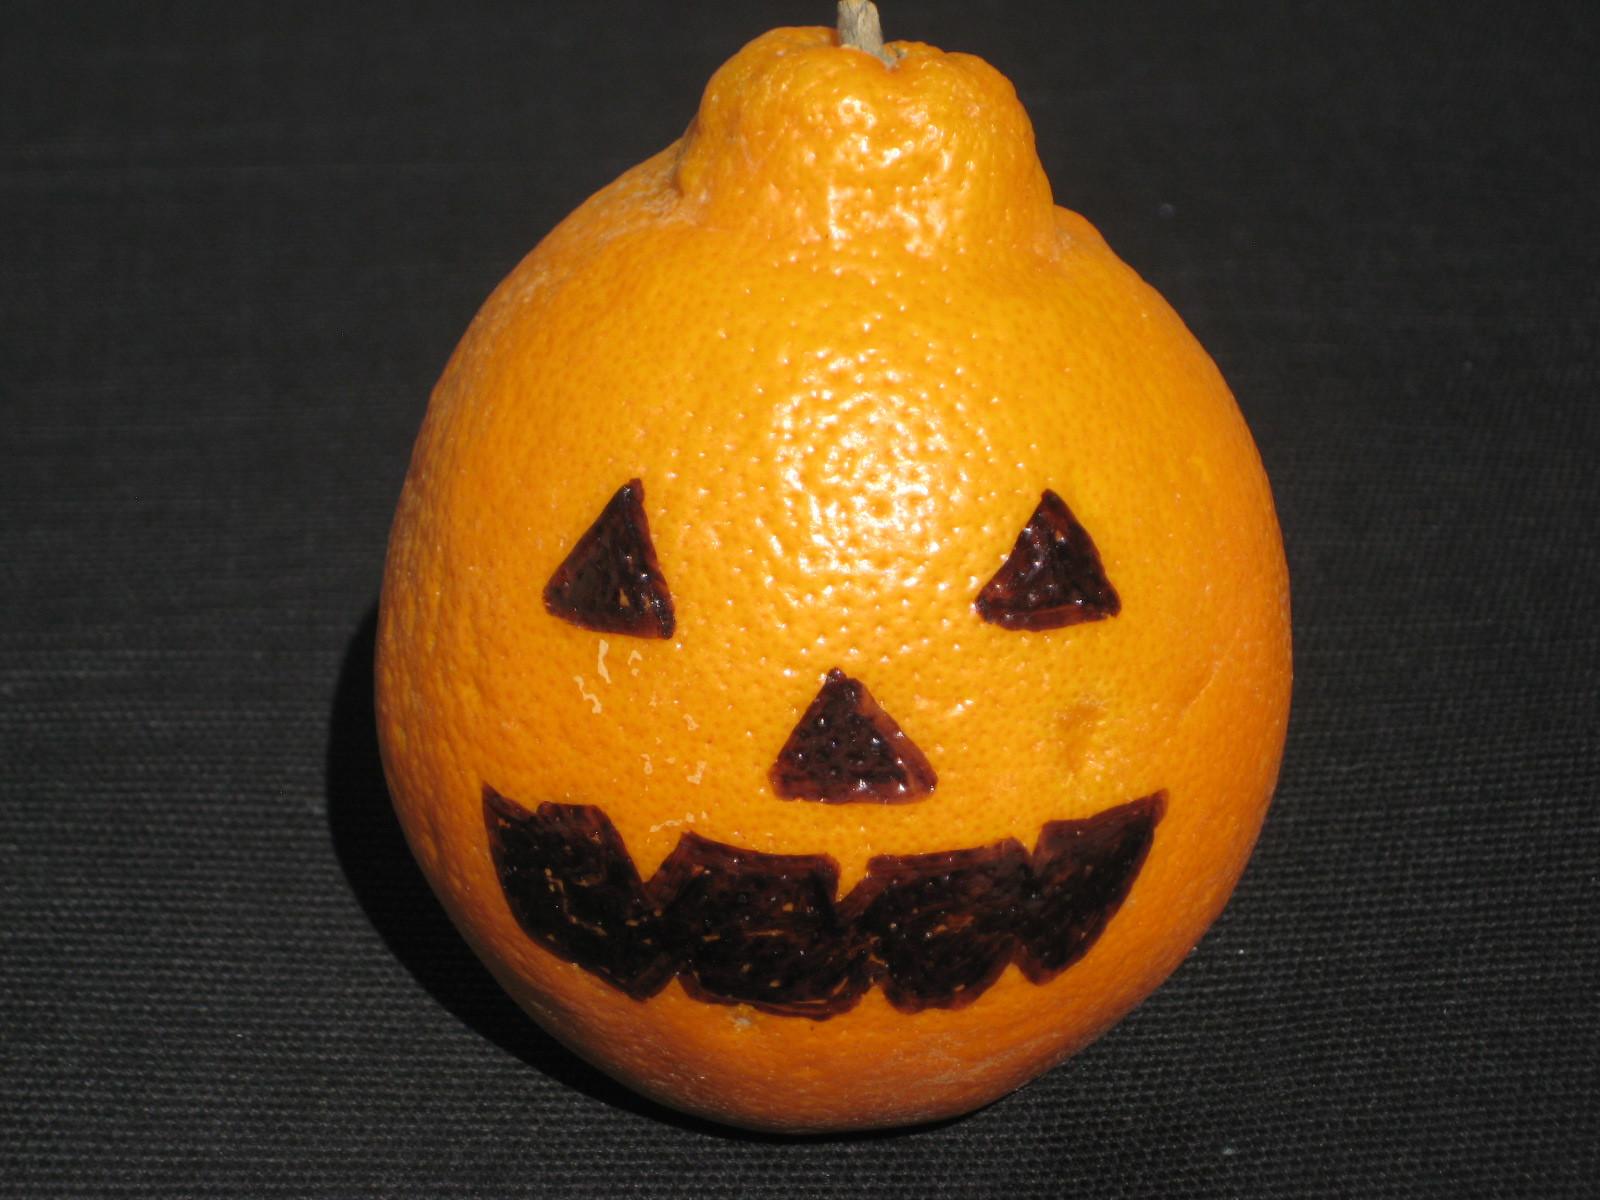 Healthy Halloween Snacks For School  Healthy Halloween Treats 15 school party ideas that kids